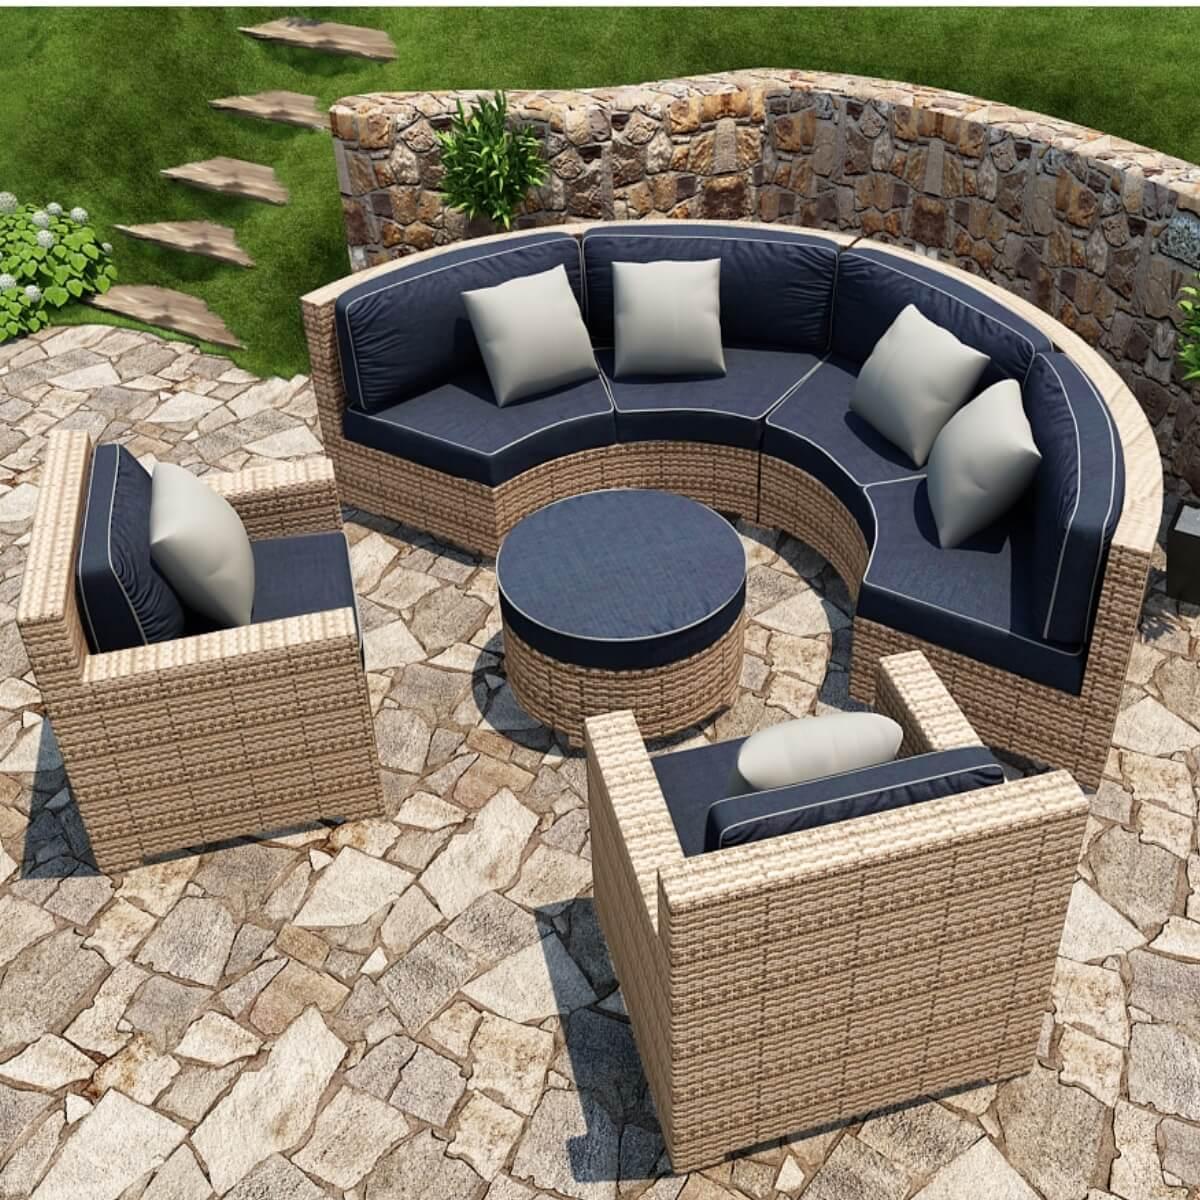 5 Piece Hampton Radius Sectional Outdoor Patio Furniture ... on 5 Piece Sectional Patio Set id=61978